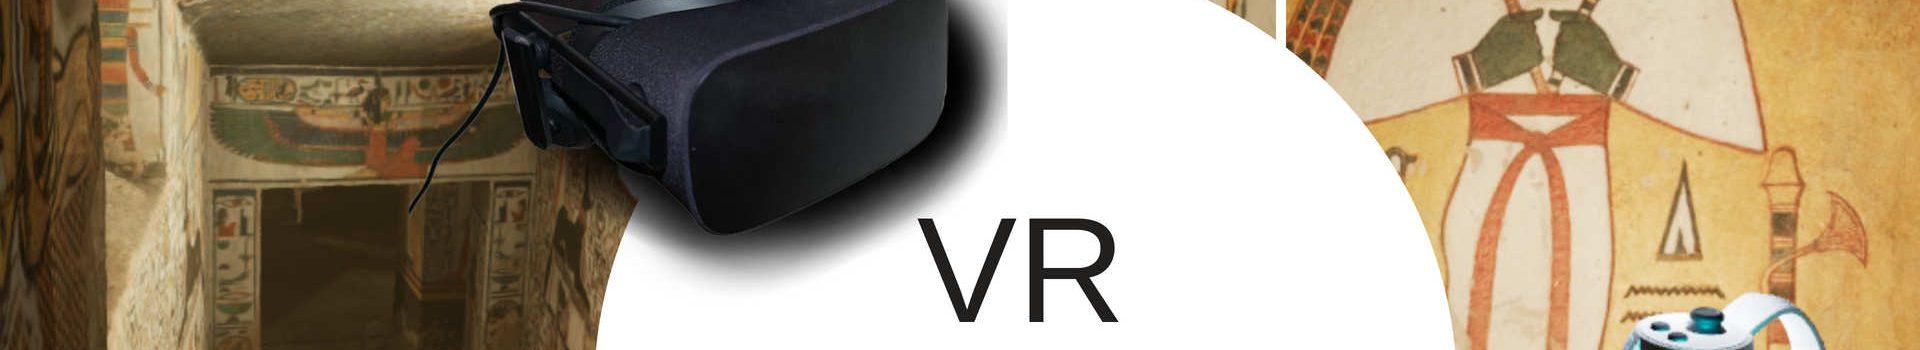 nefertari-journey-to-eternity-oculus-rift